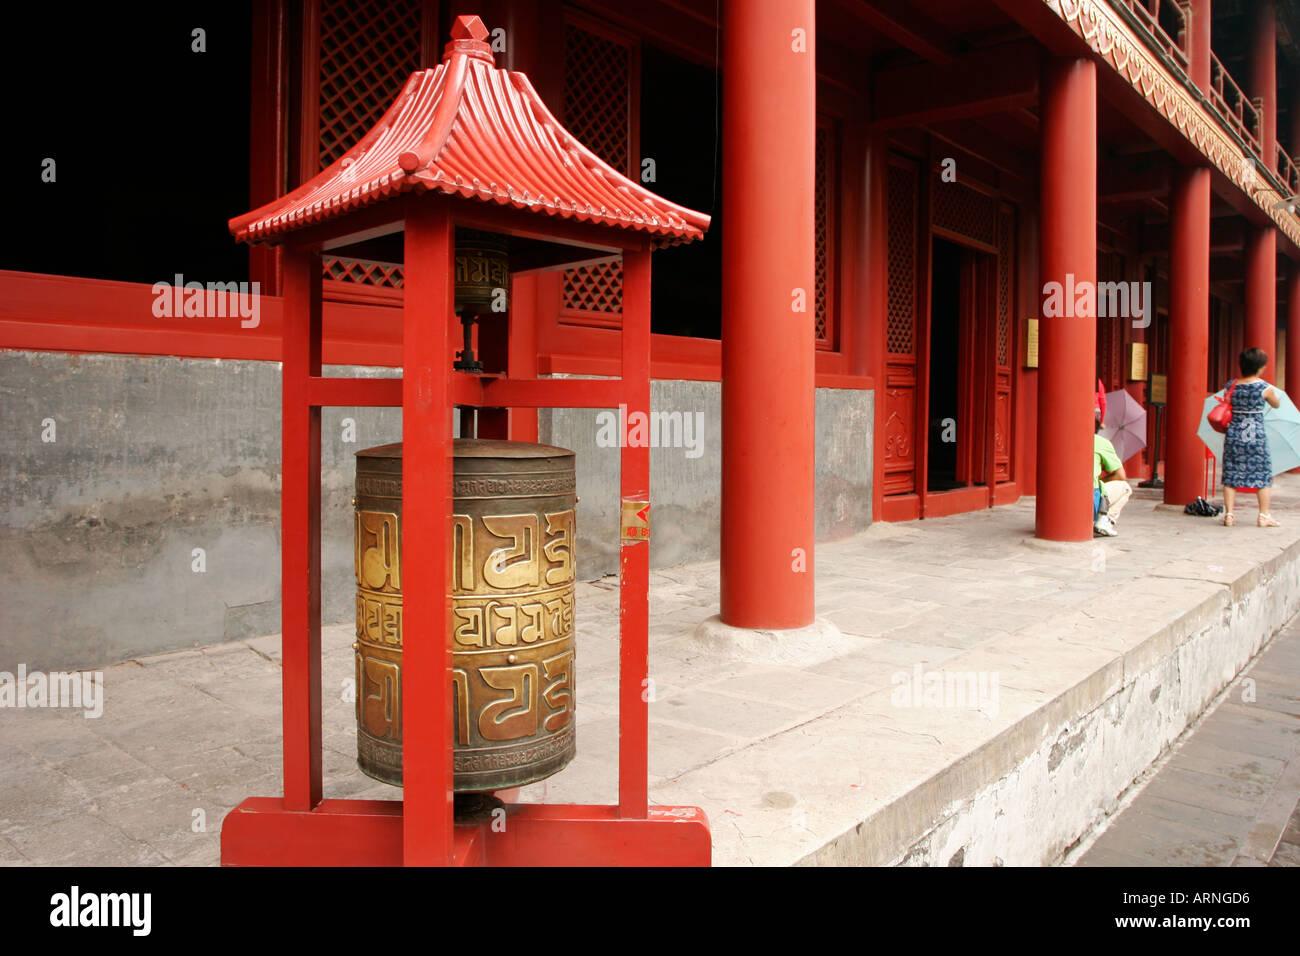 Prayer wheels at the Lama Temple in Beijing China alamyprorank - Stock Image